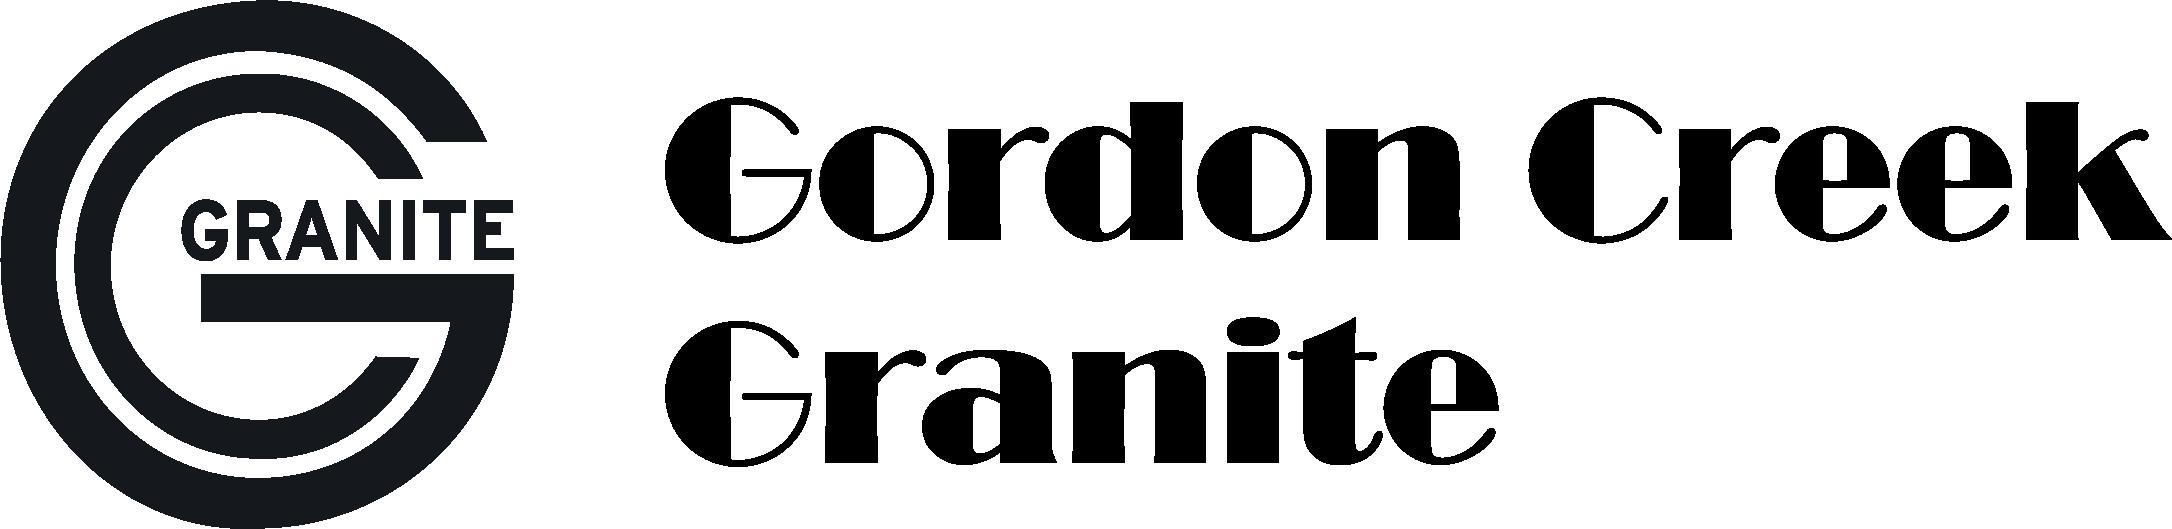 Gordon Creek Granite